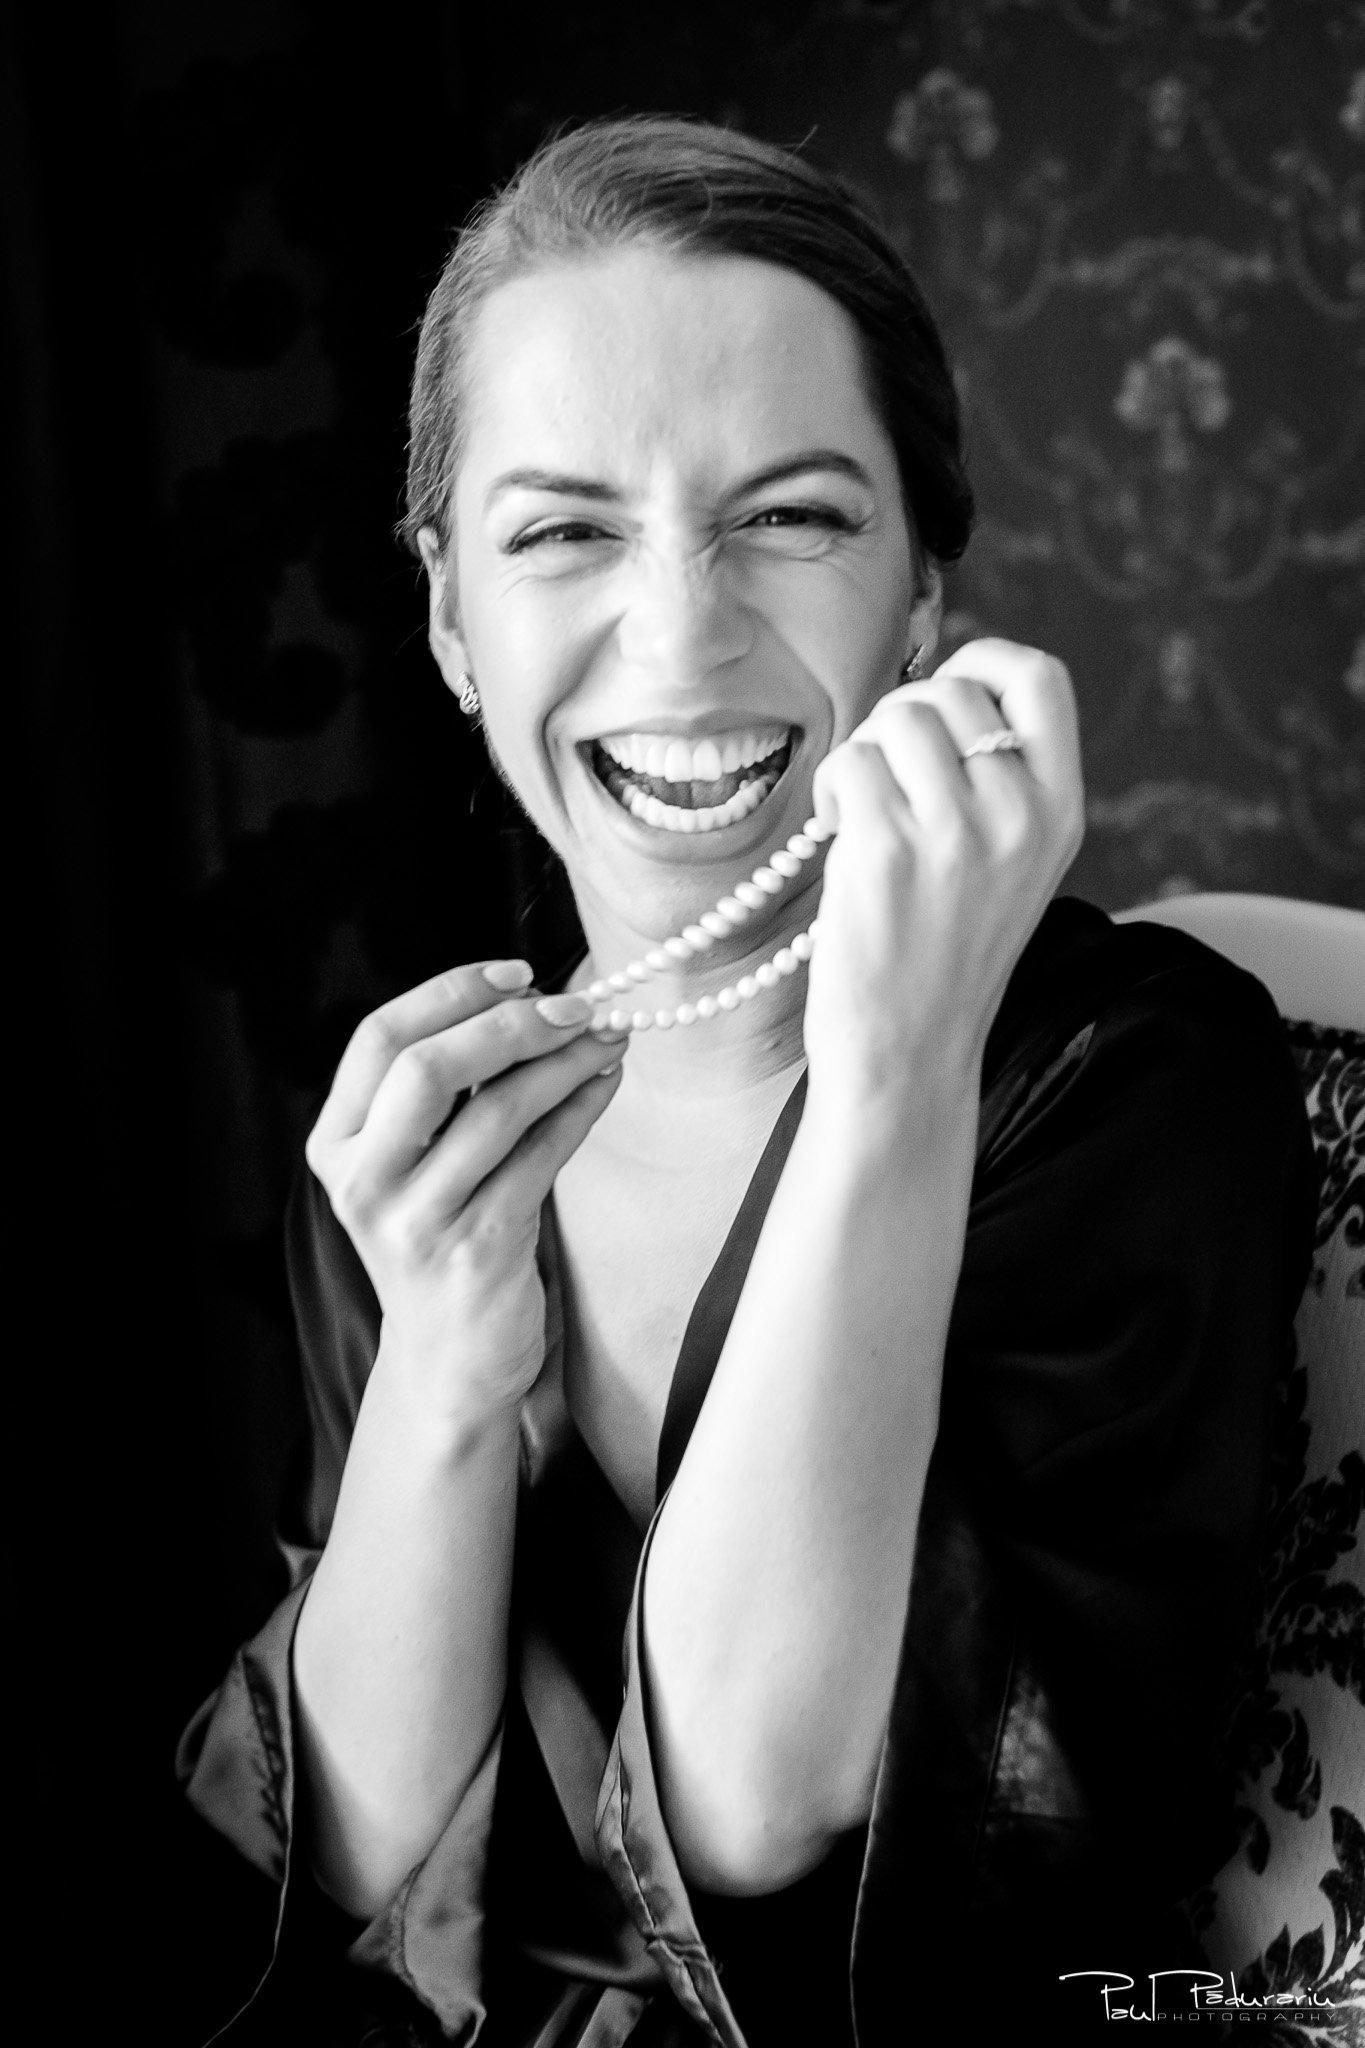 Roxana si Silviu Nunta Hotel Eden Iasi - pregatiri mireasa portret cu margele - fotograf profesionist nunta www.paulpadurariu.ro © 2017 Paul Padurariu